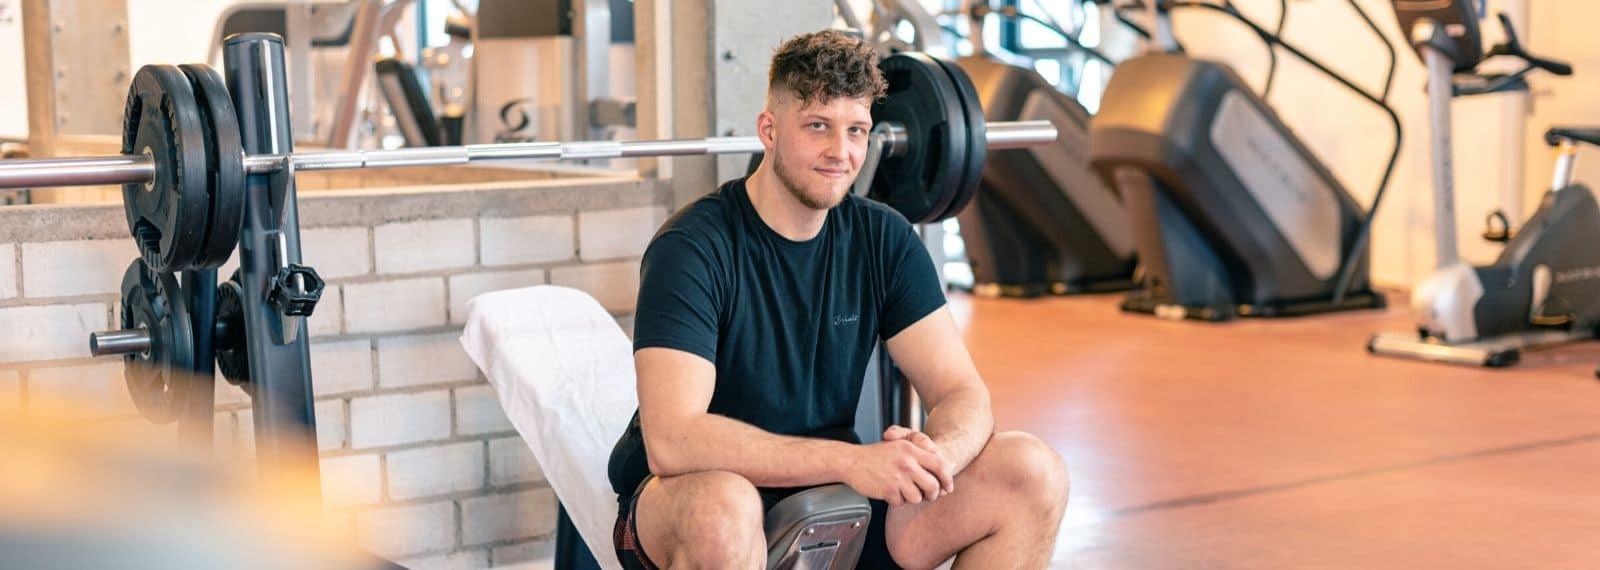 Abnehm-Erfolgsstory aus dem Fitness-Loft Gundelfingen